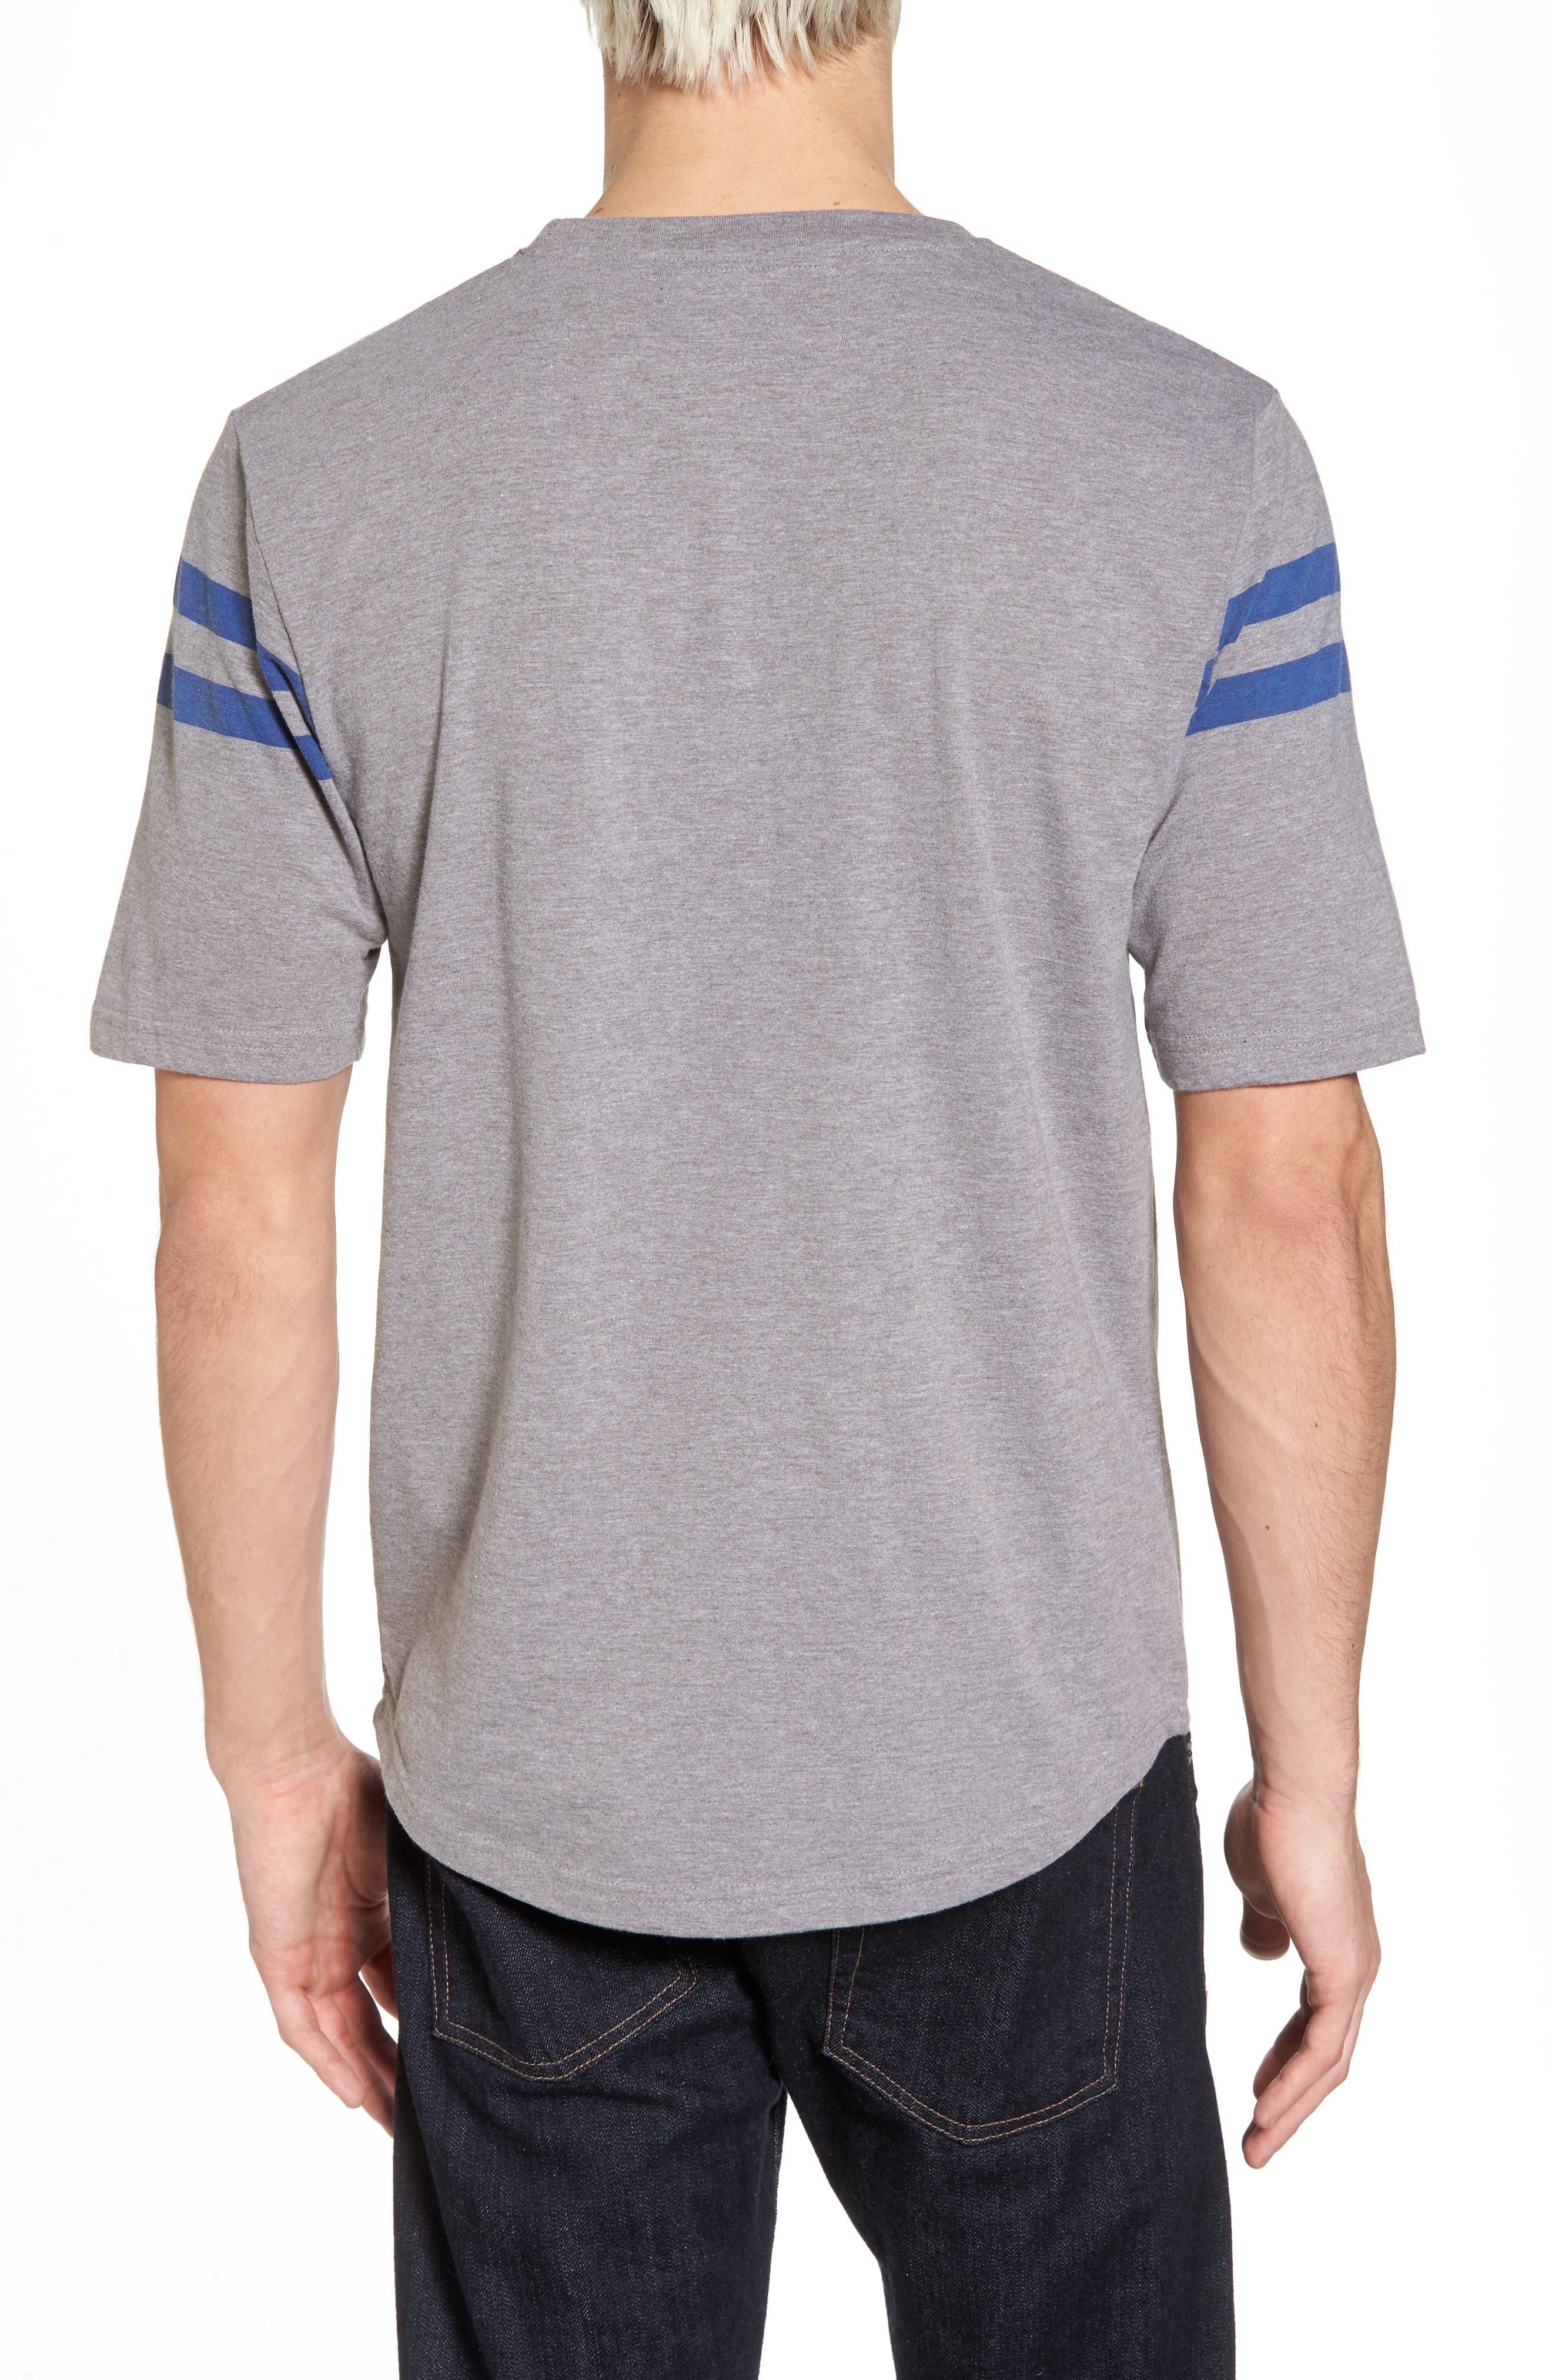 Crosby New York Rangers T-Shirt,                             Alternate thumbnail 2, color,                             073